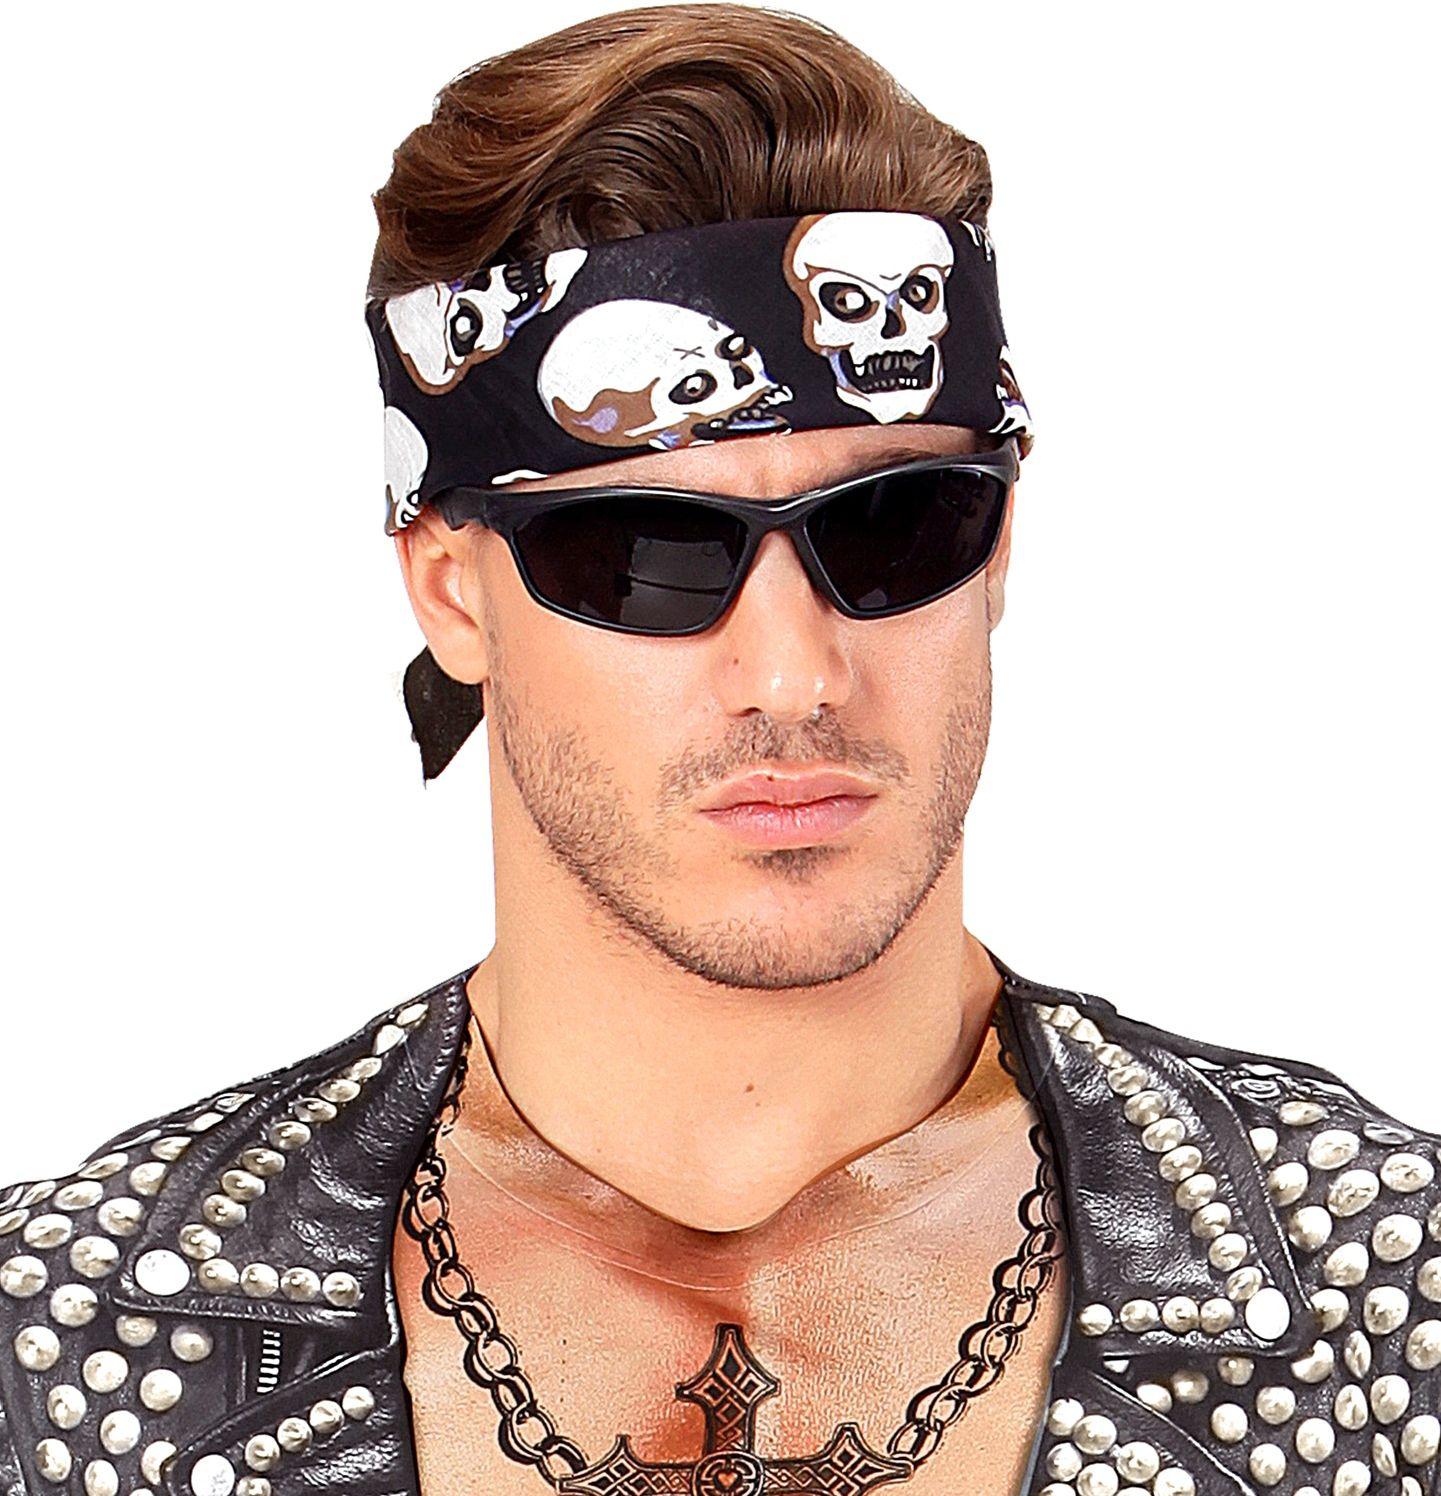 Skelet bandana